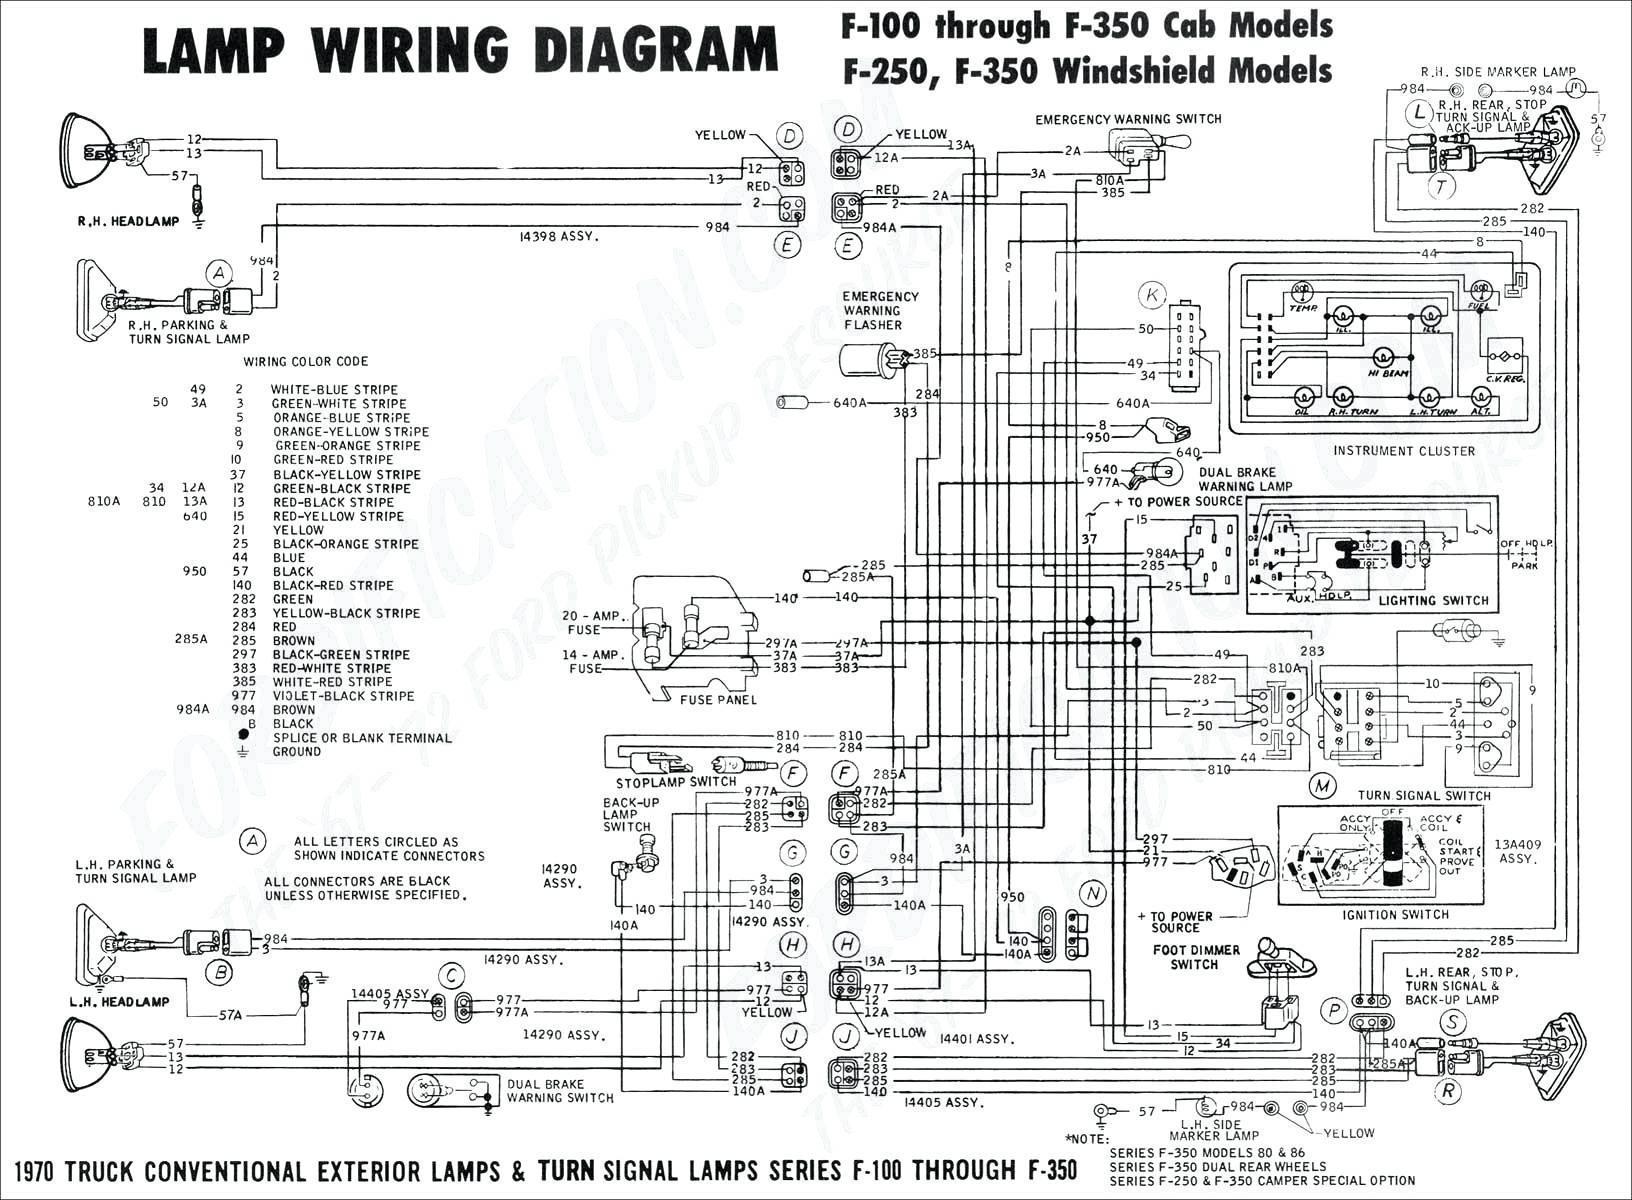 Dodge Hemi 5 7 Engine Diagram Belt Diagram 2006 Dodge 1500 Hemi Wire Data Schema • Of Dodge Hemi 5 7 Engine Diagram